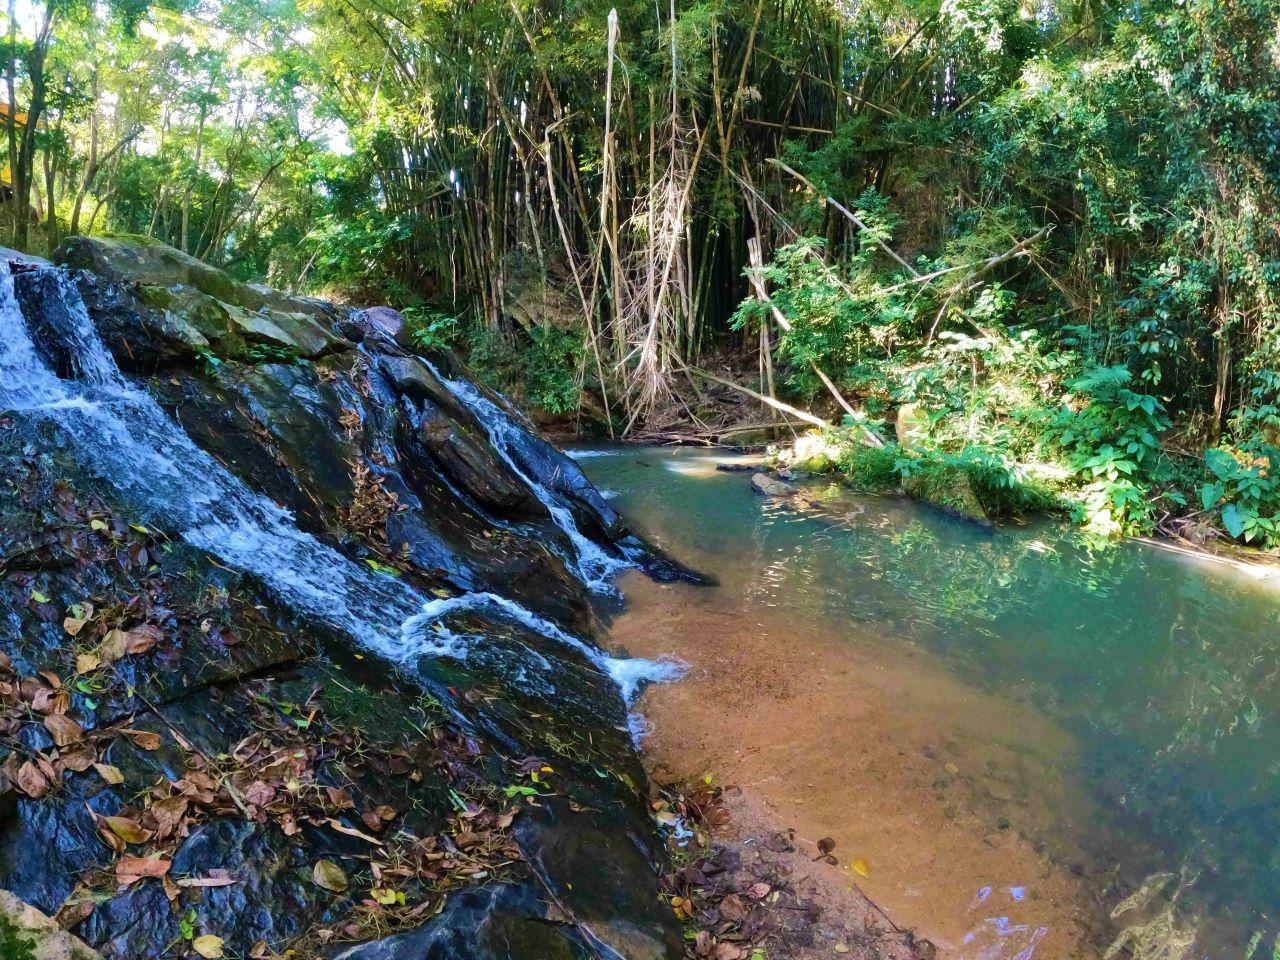 cachoeira com escoamento de 1 metro entre as pedras